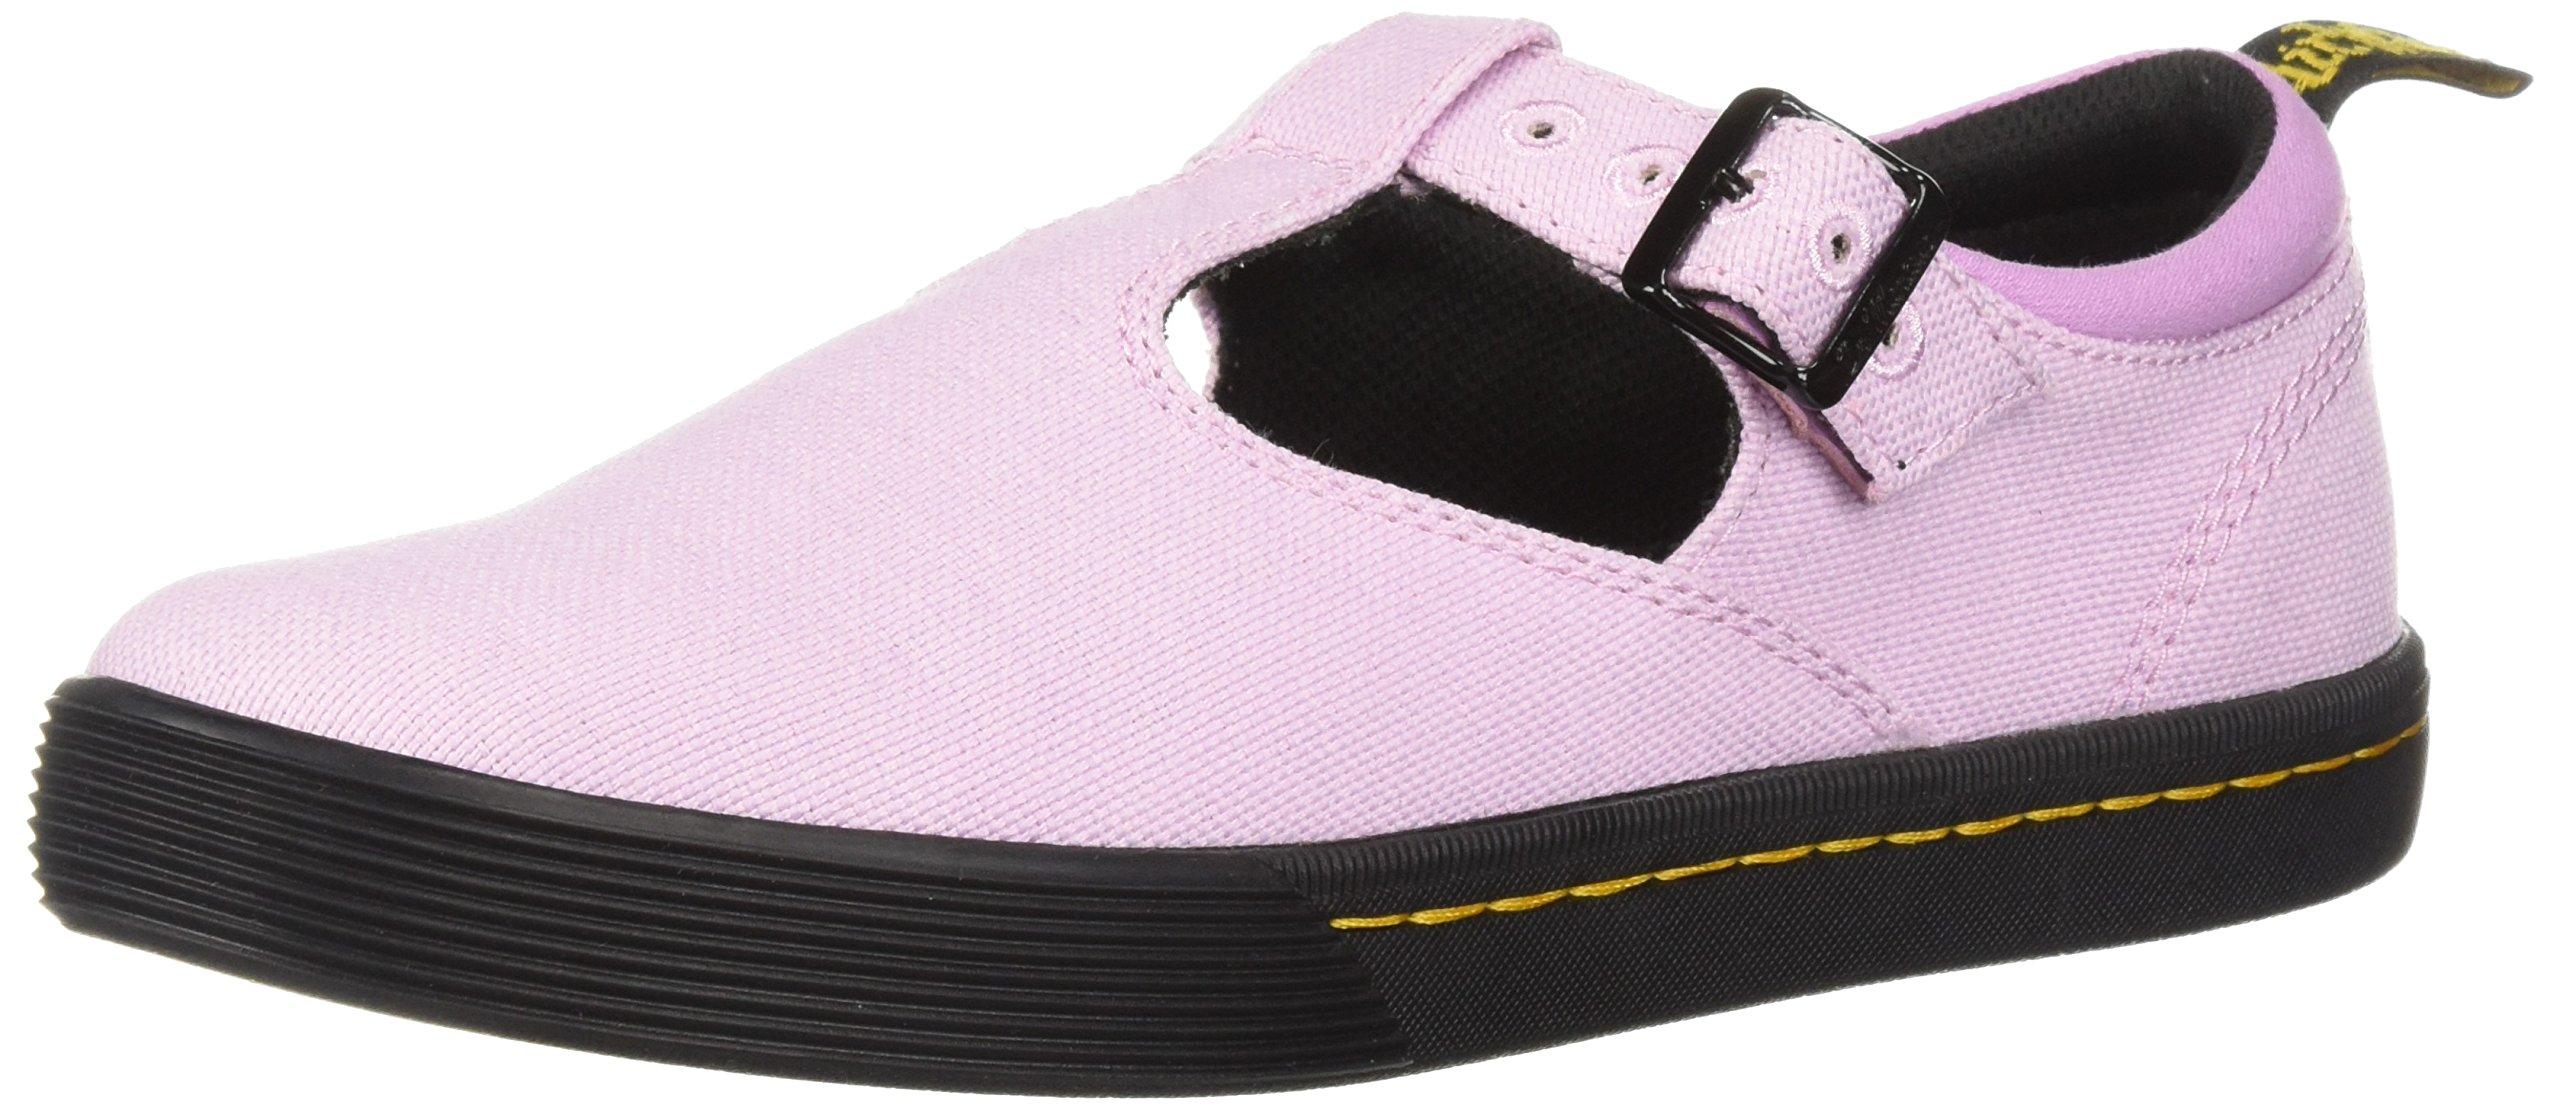 Dr. Martens Women's Winona Mary Jane Flat, Mallow Pink Woven Textile+Fine Canvas, 7 Medium UK (9 US)